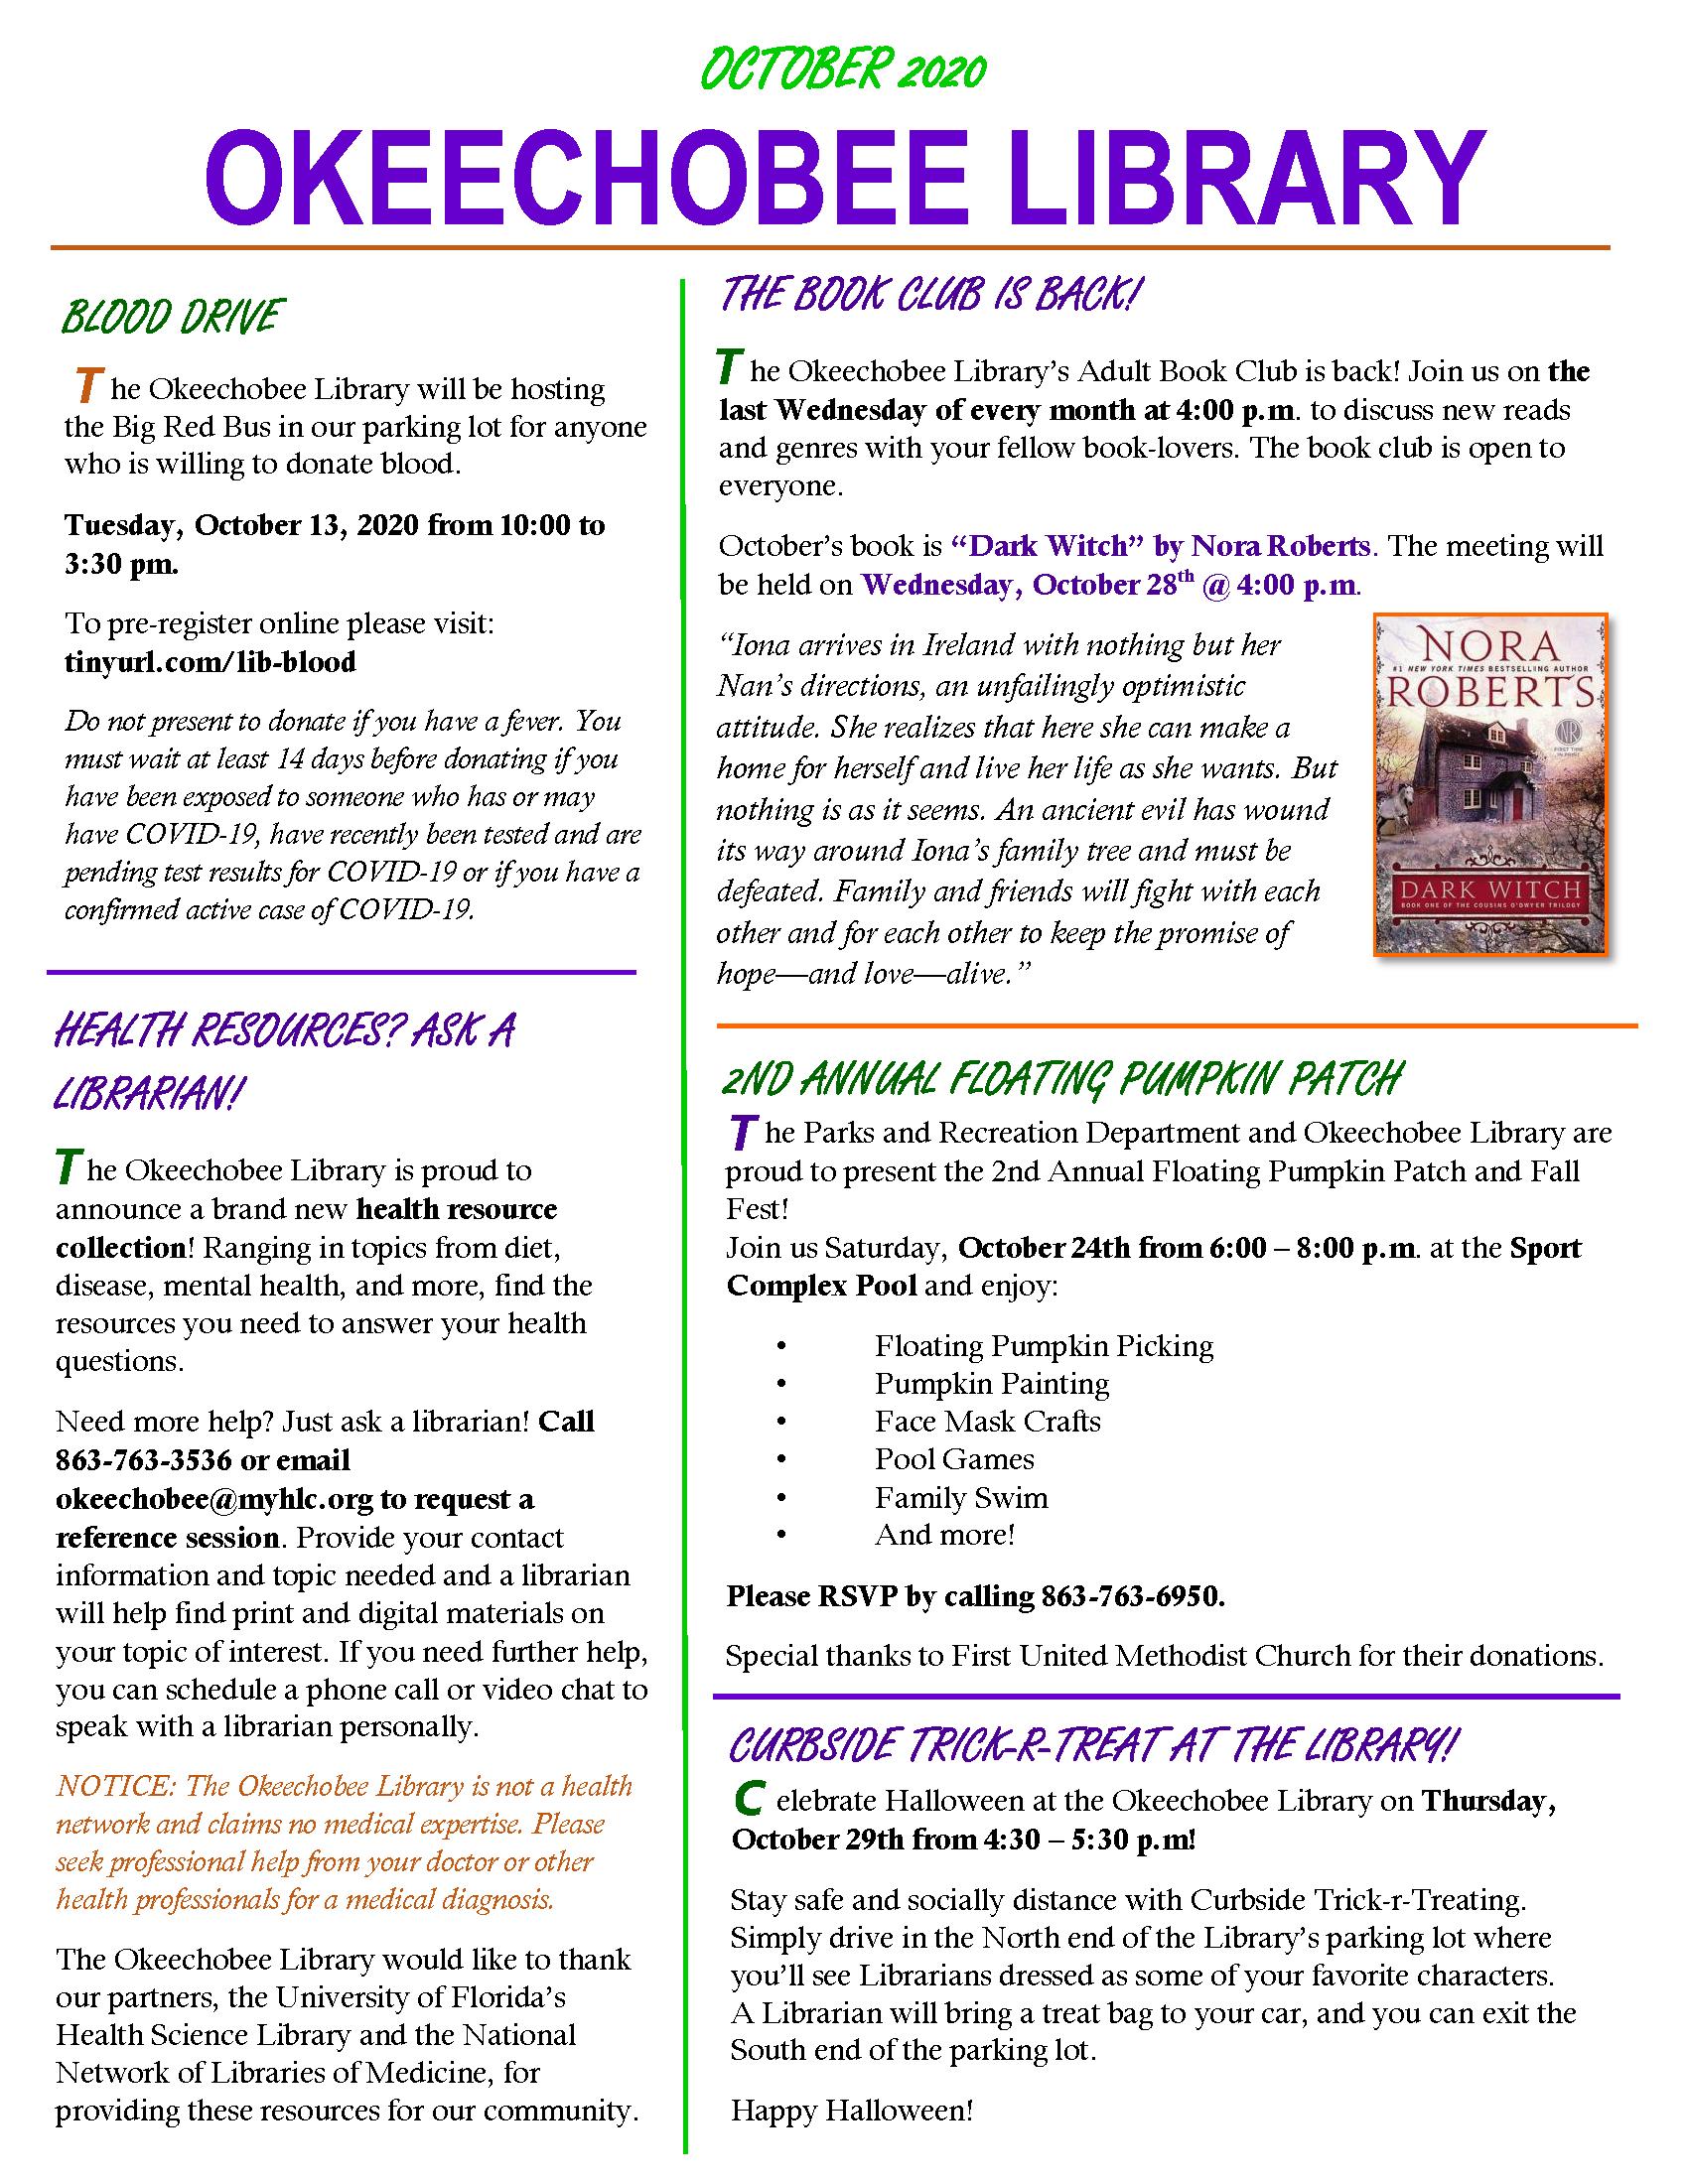 Okeechobee Library September 2020 Newsletter page 1